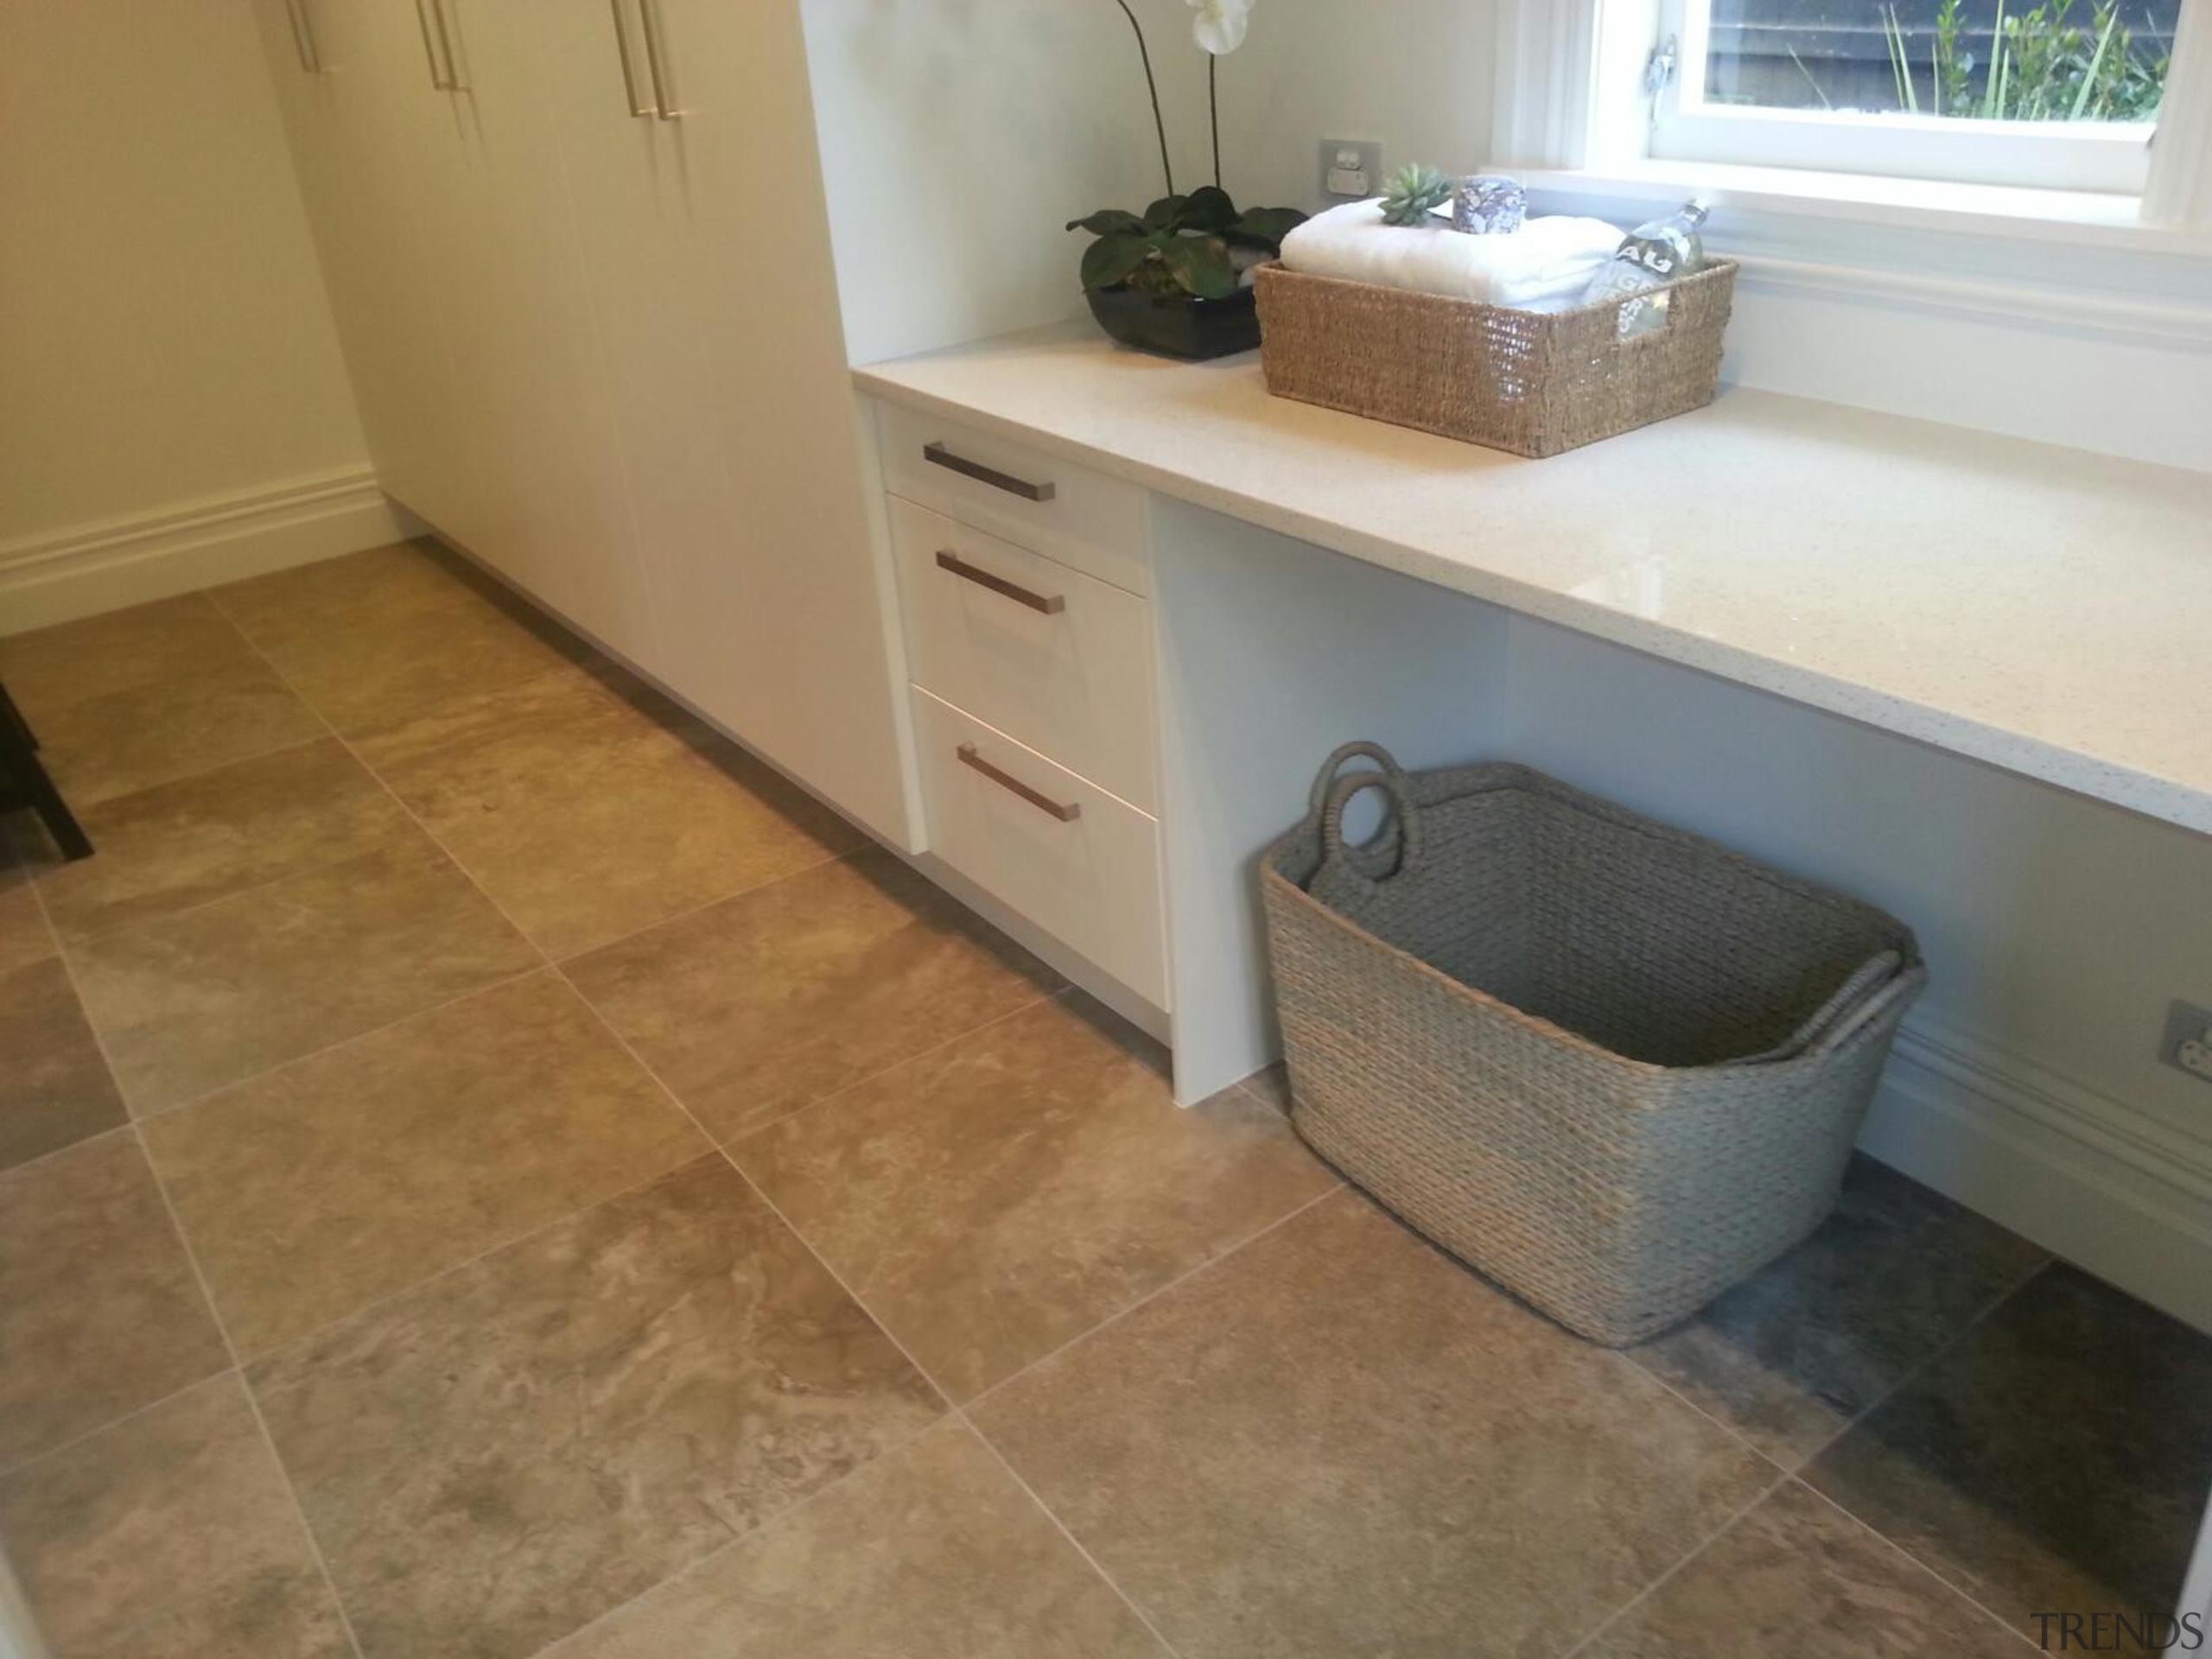 villa kitchen floor tiles velvet platinum - Velvet countertop, floor, flooring, hardwood, kitchen, laminate flooring, property, room, tile, wood, wood flooring, wood stain, brown, gray